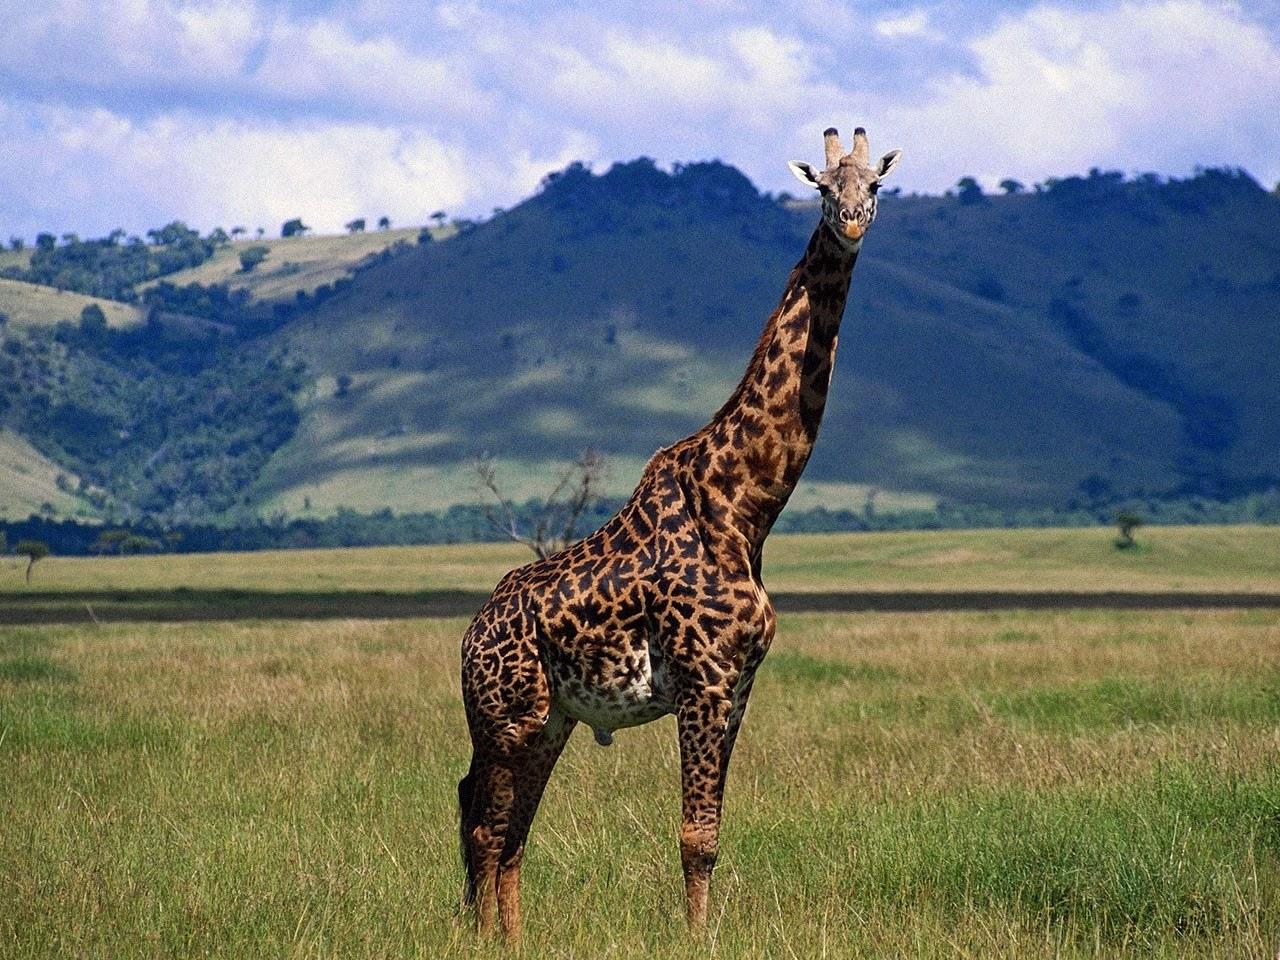 picture of a giraffe